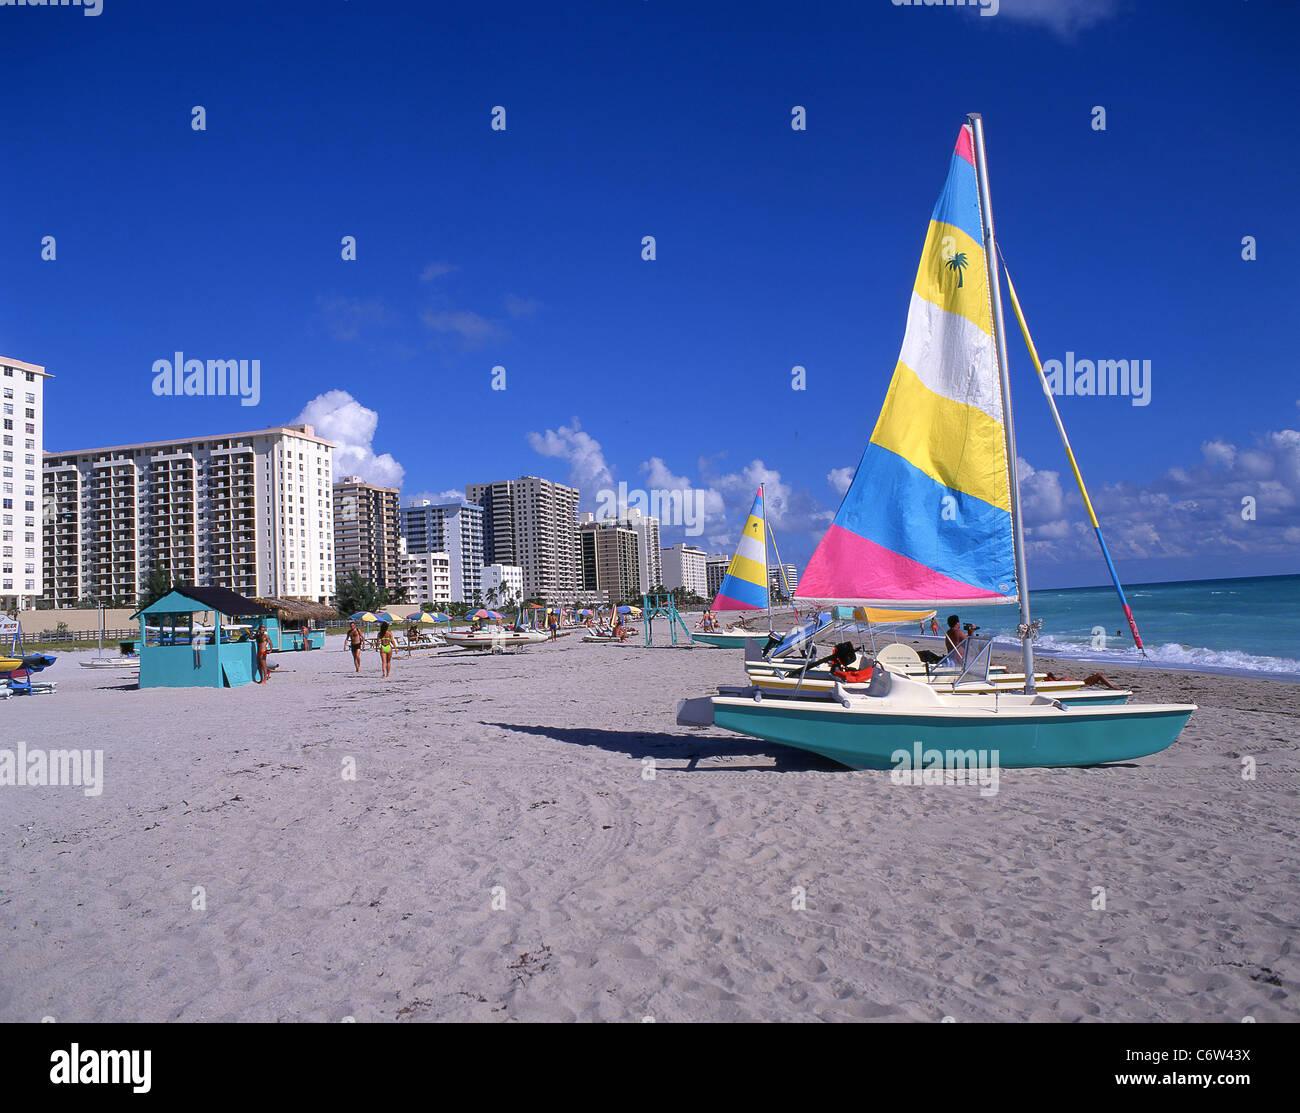 South Beach, Miami Beach, Florida, United States of America - Stock Image